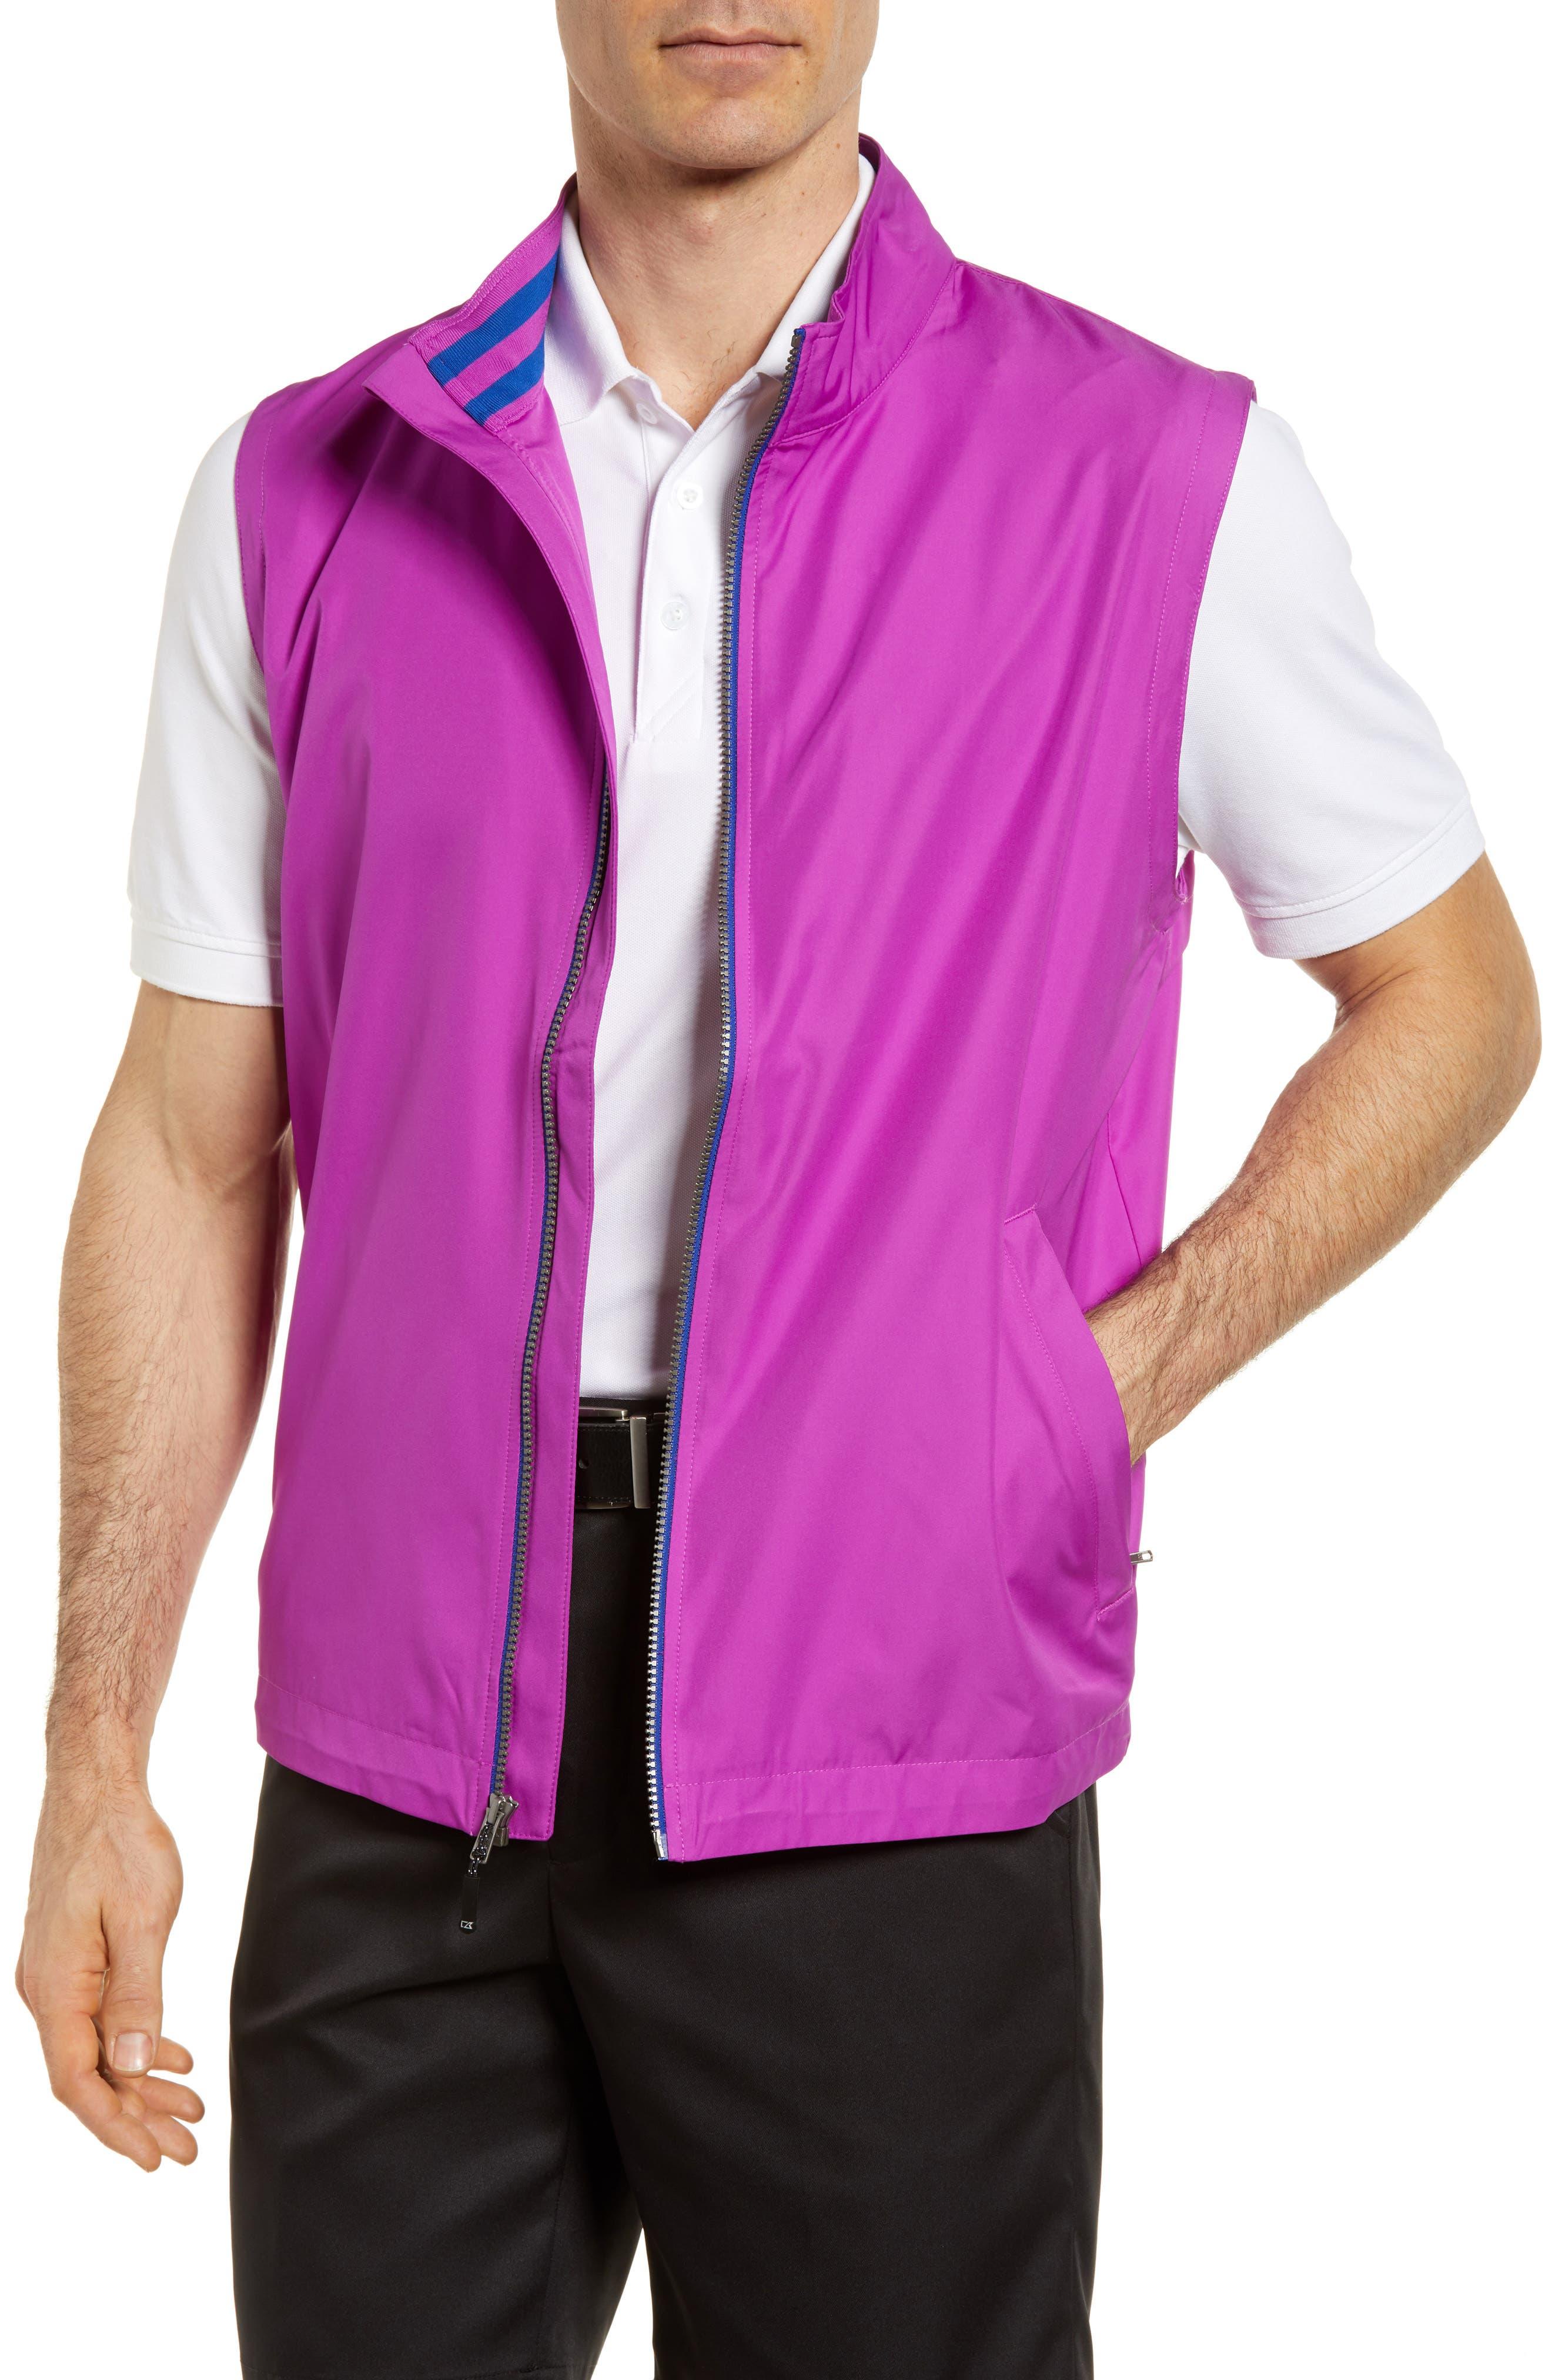 Cutter & Buck Nine Iron Drytec Zip Vest, Purple